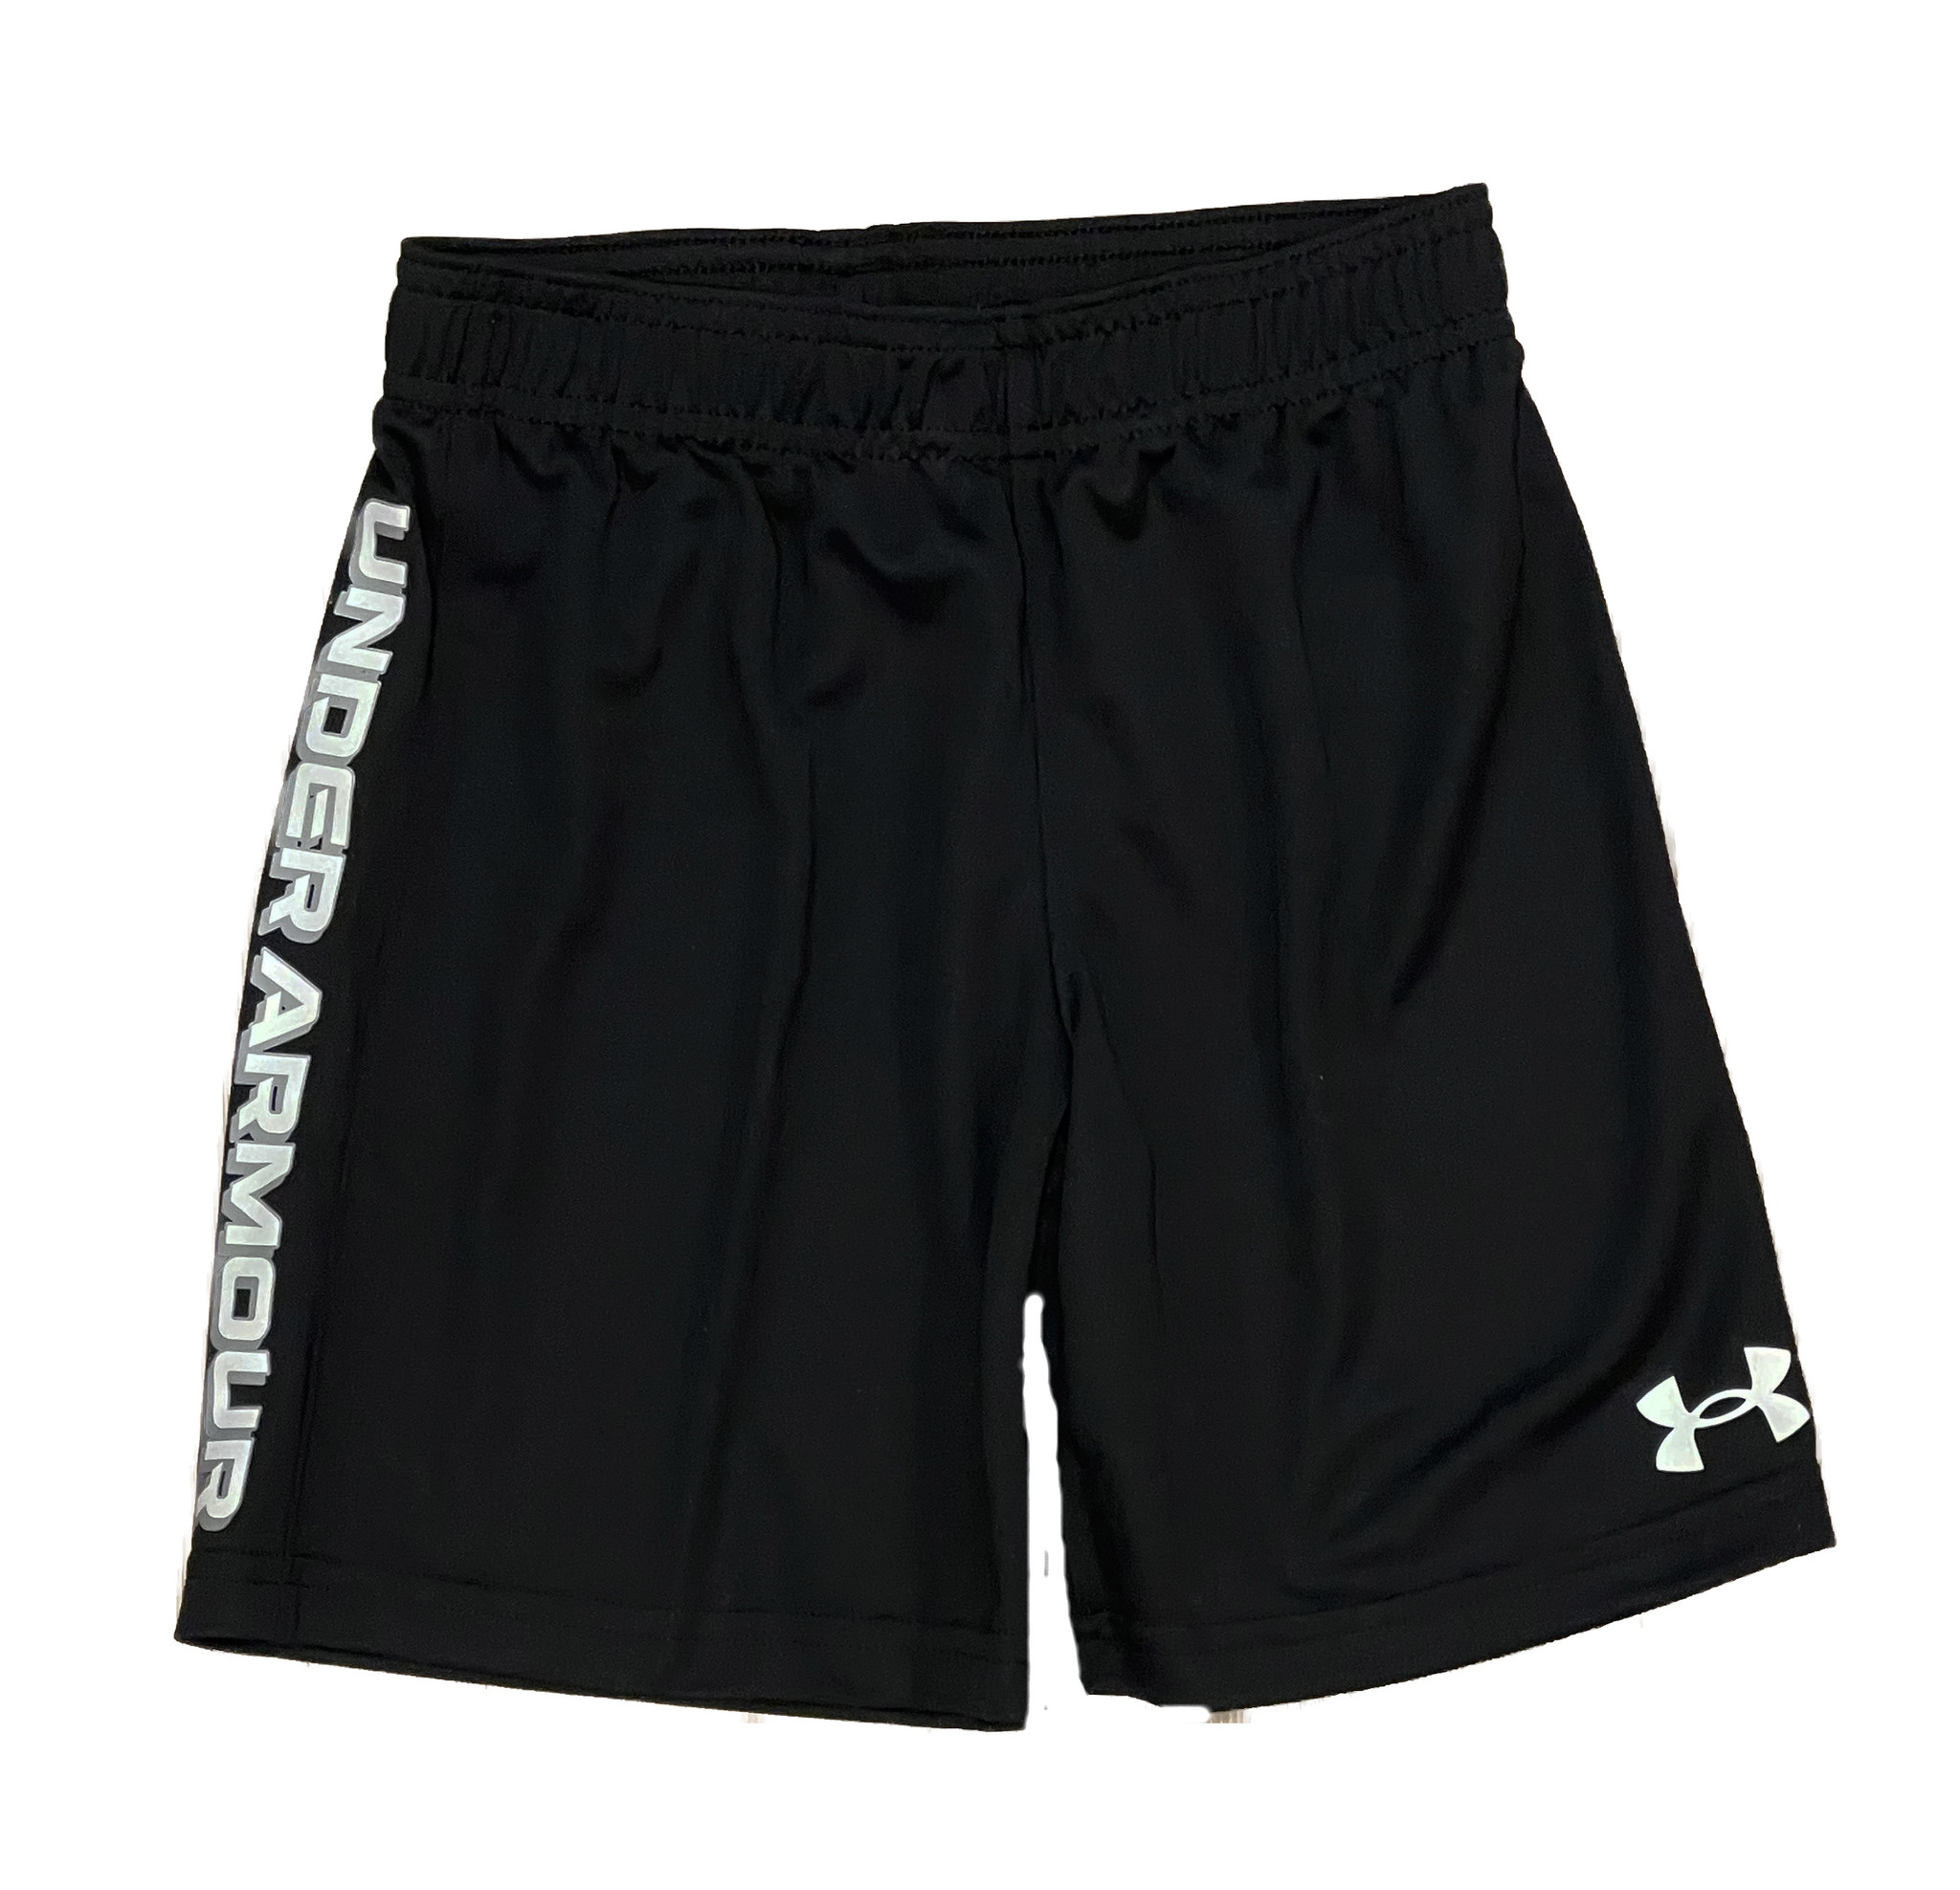 Under Armour Black UA Logo Shorts